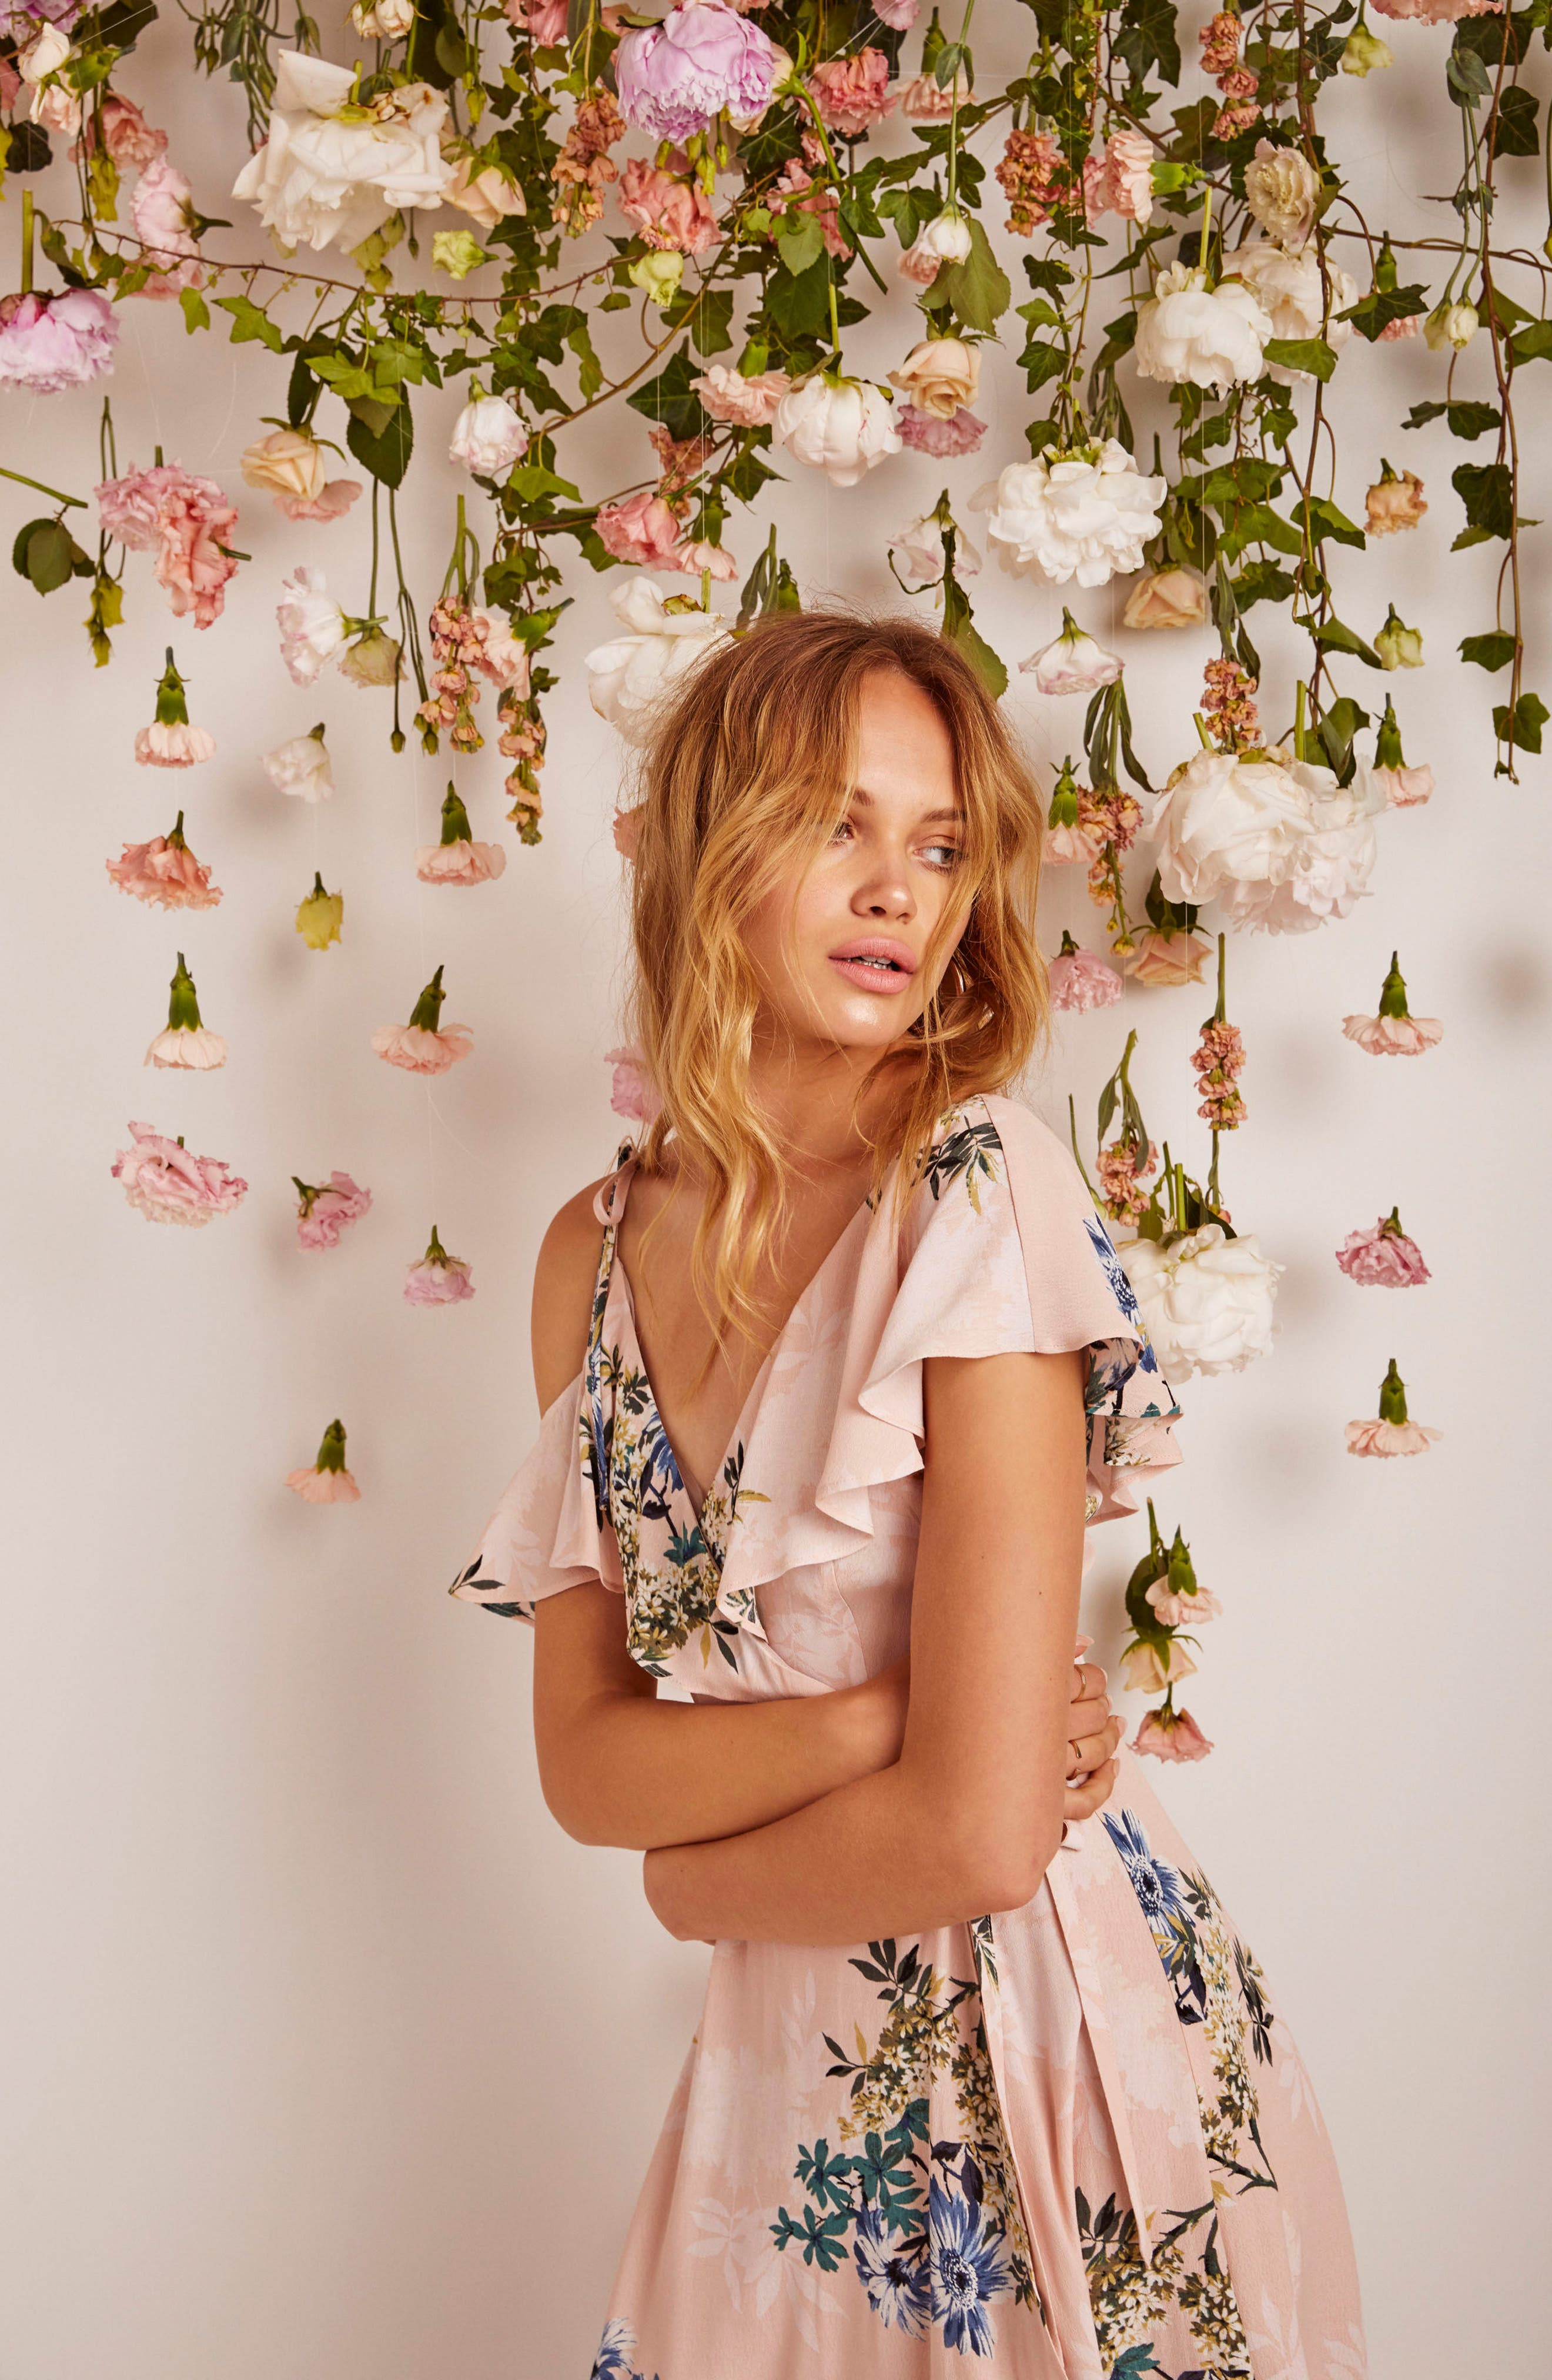 Yessenia Wrap Dress,                             Alternate thumbnail 4, color,                             Blush Multi Floral